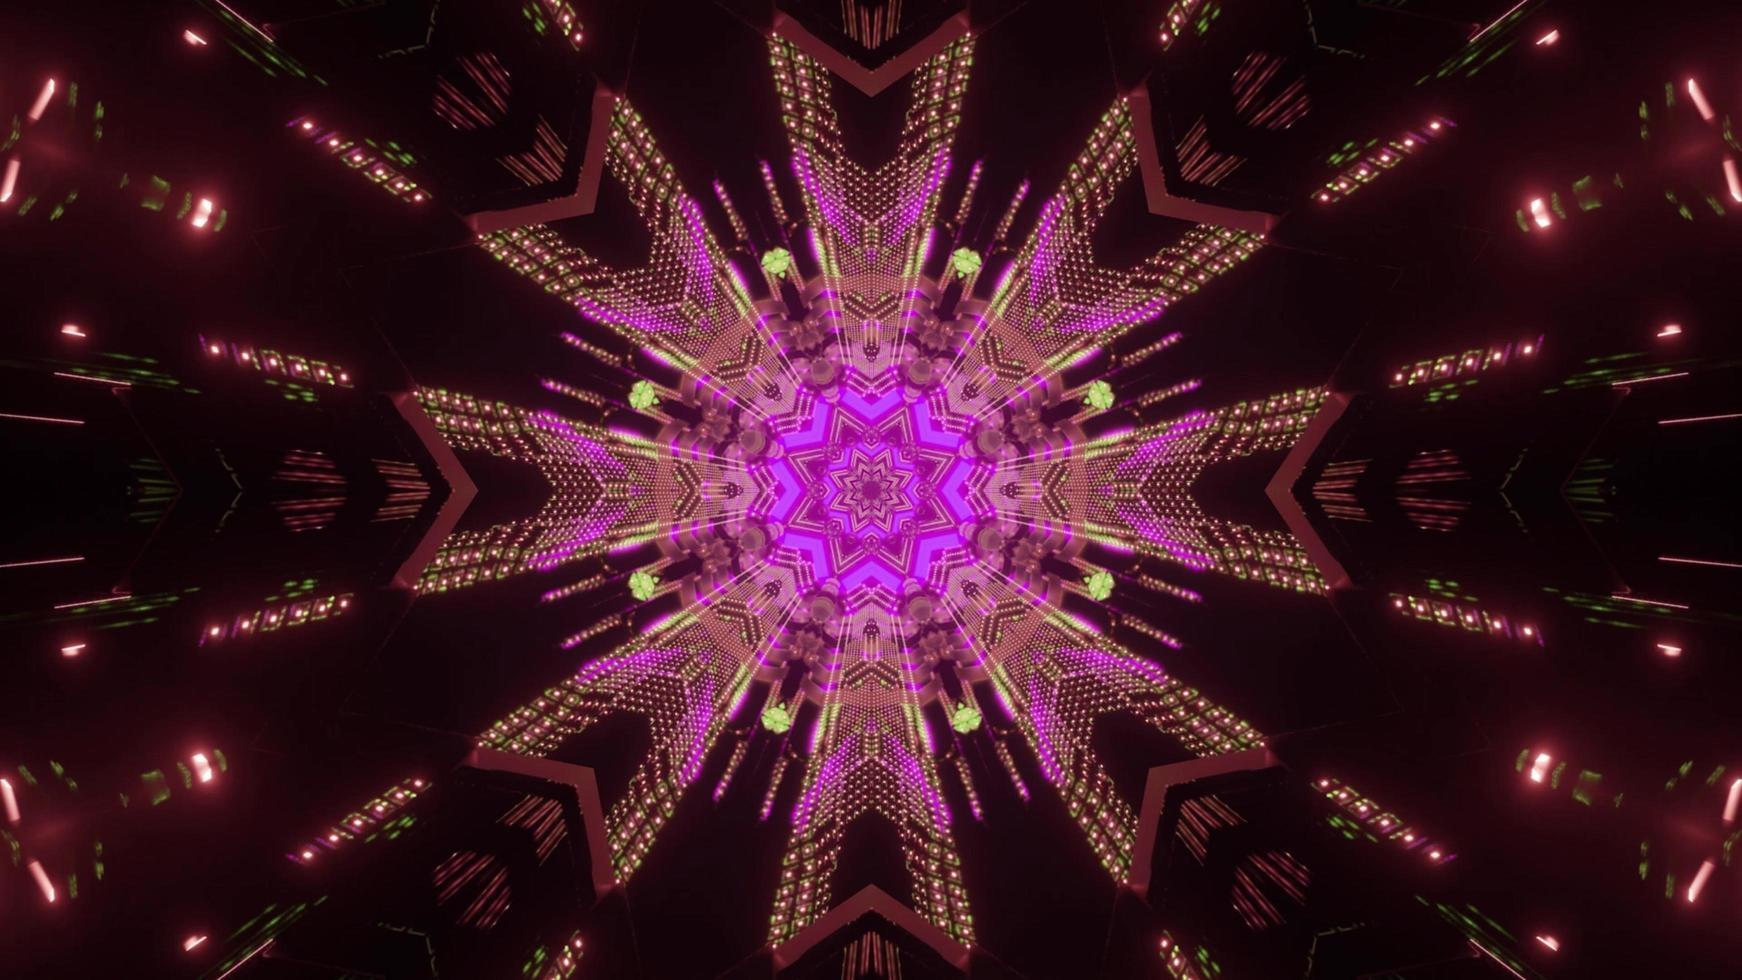 Gleaming neon geometric ornament 3d illustration photo